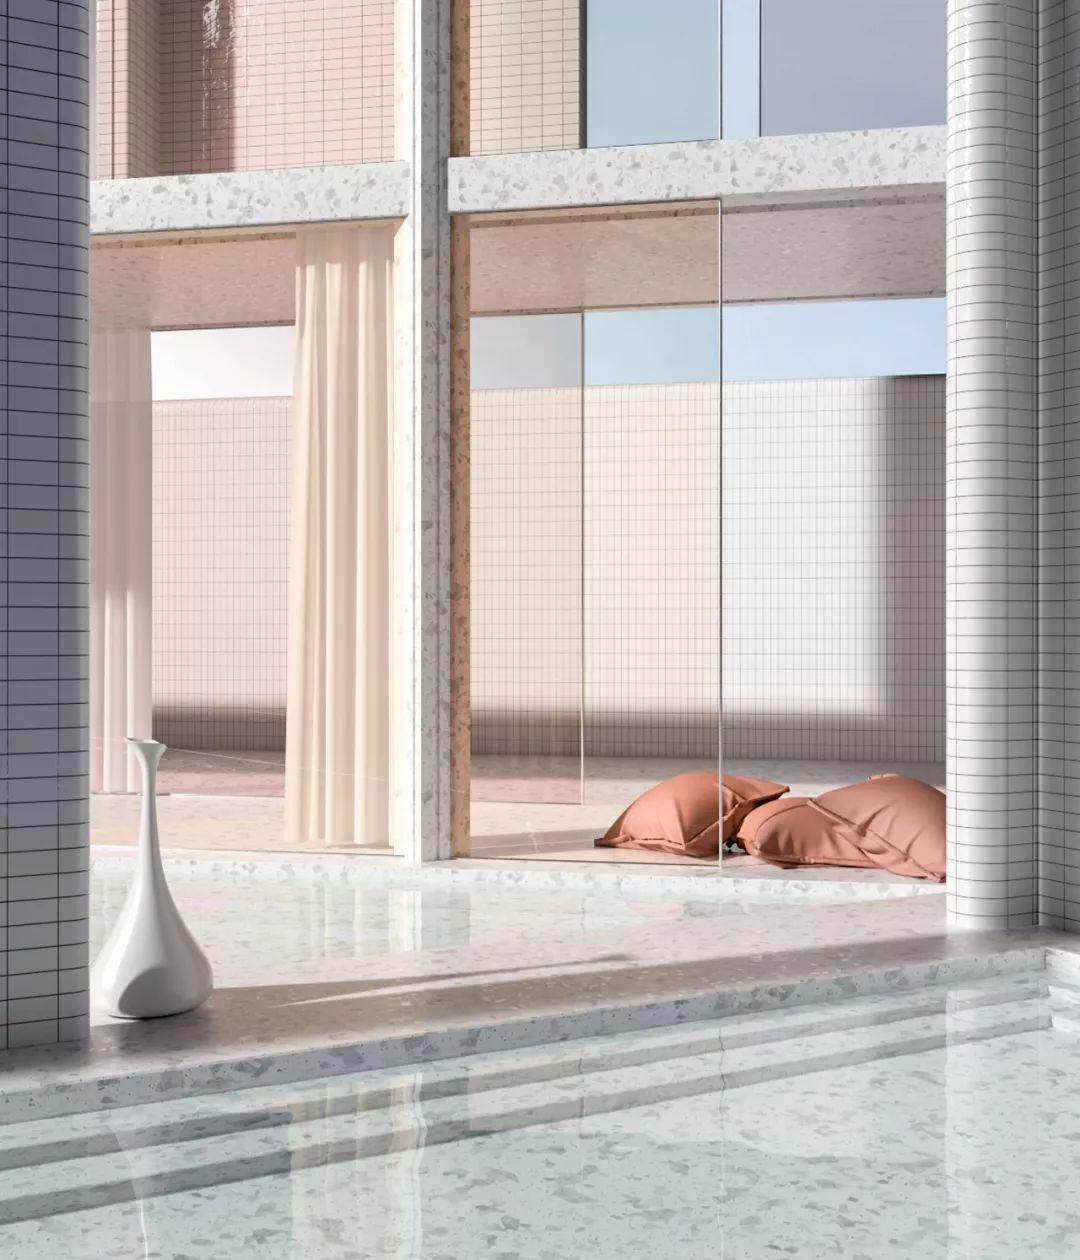 Alexis Christodoulou | 渲染艺术家梦幻般的空间